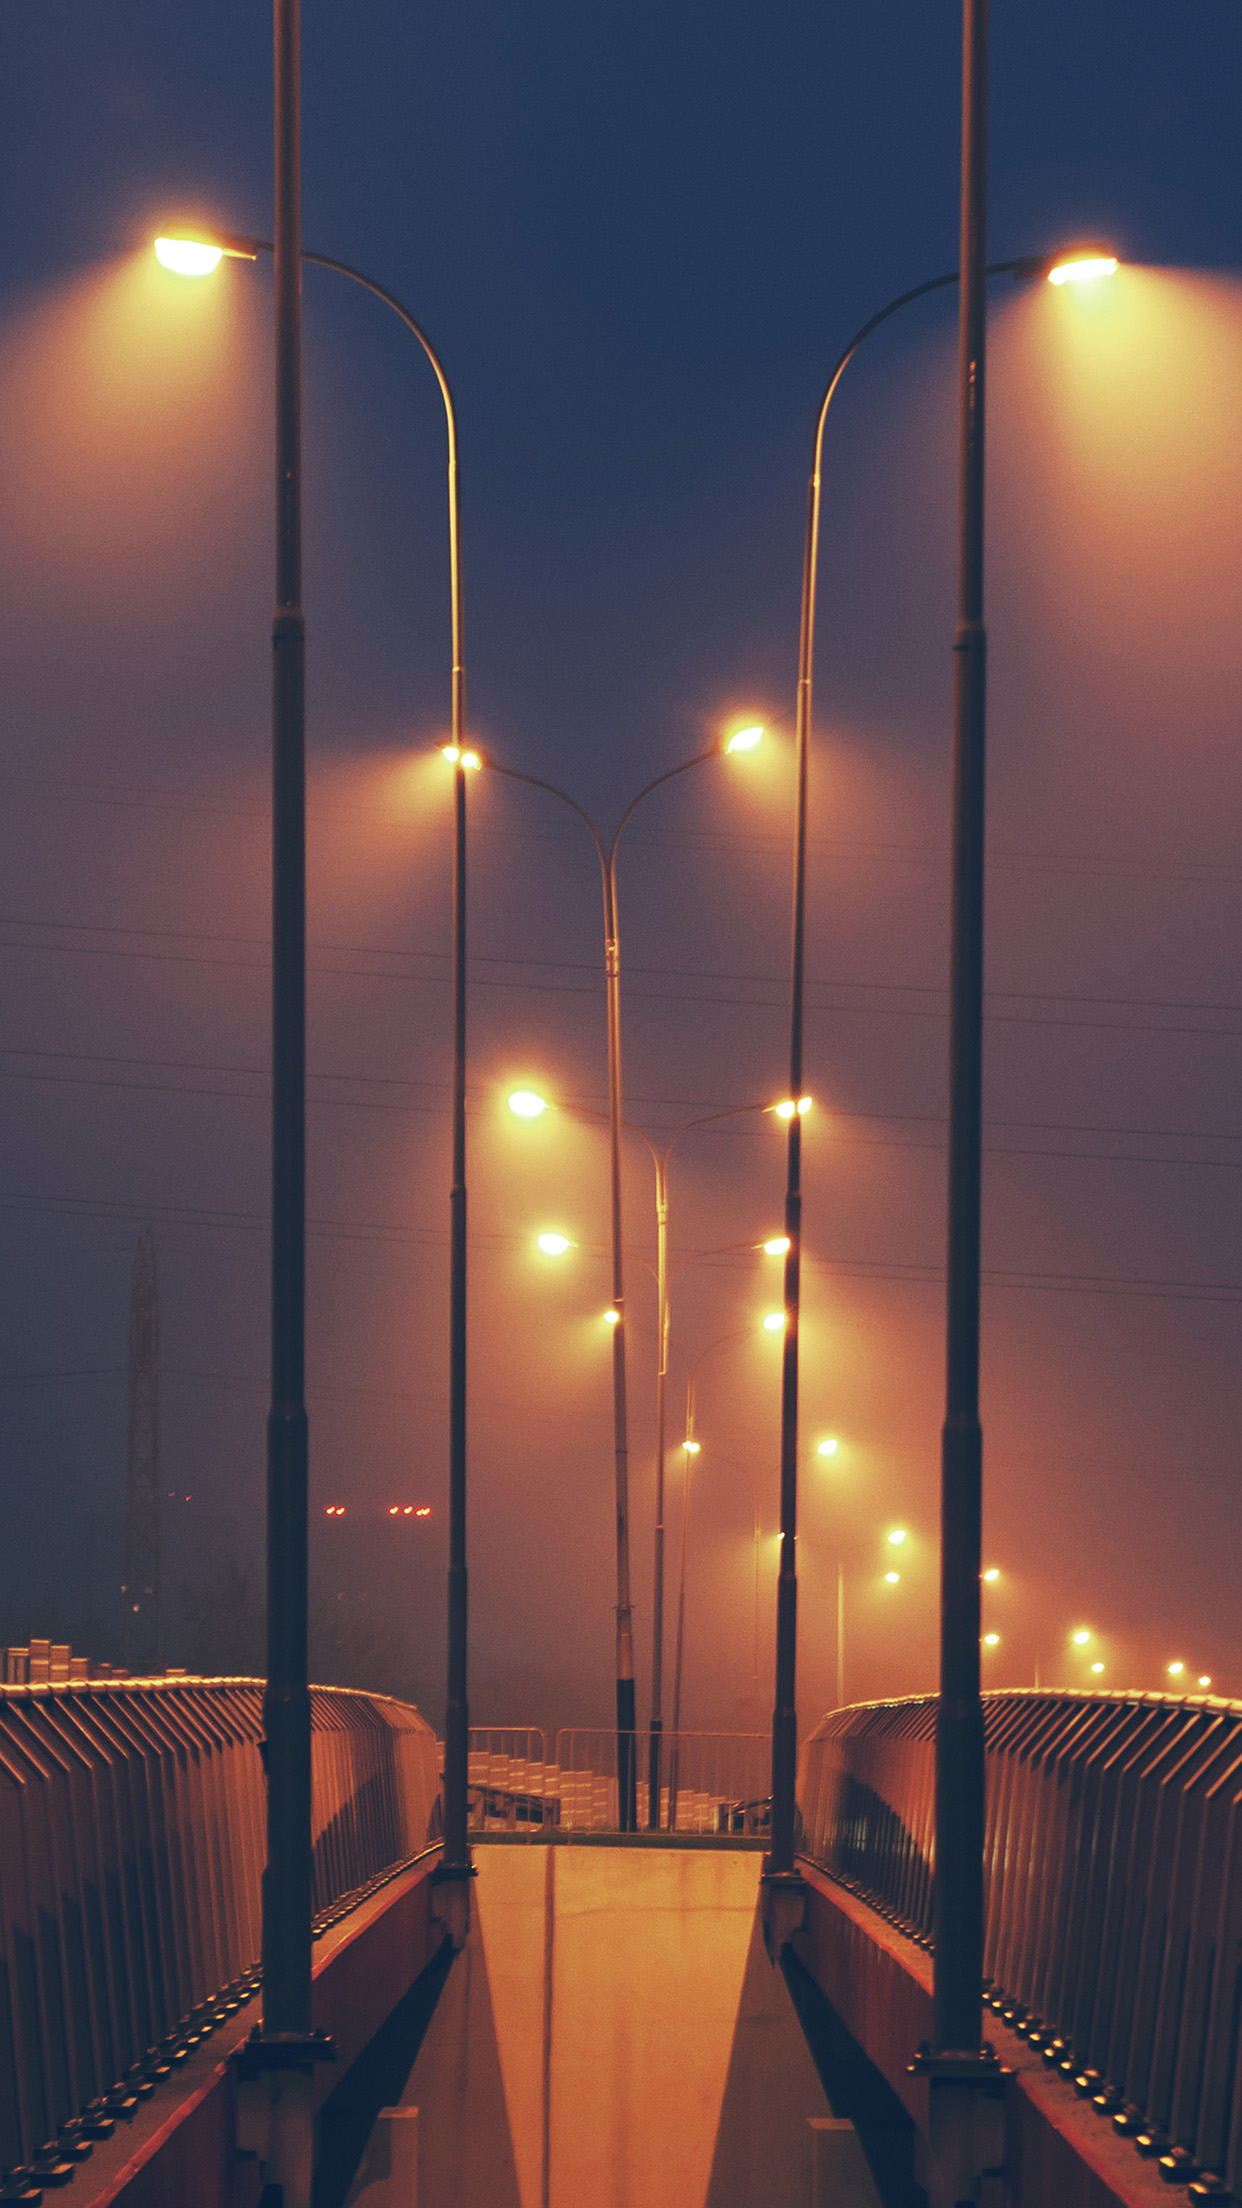 mv05-night-bridge-city-view-lights-street-orange-dark ...